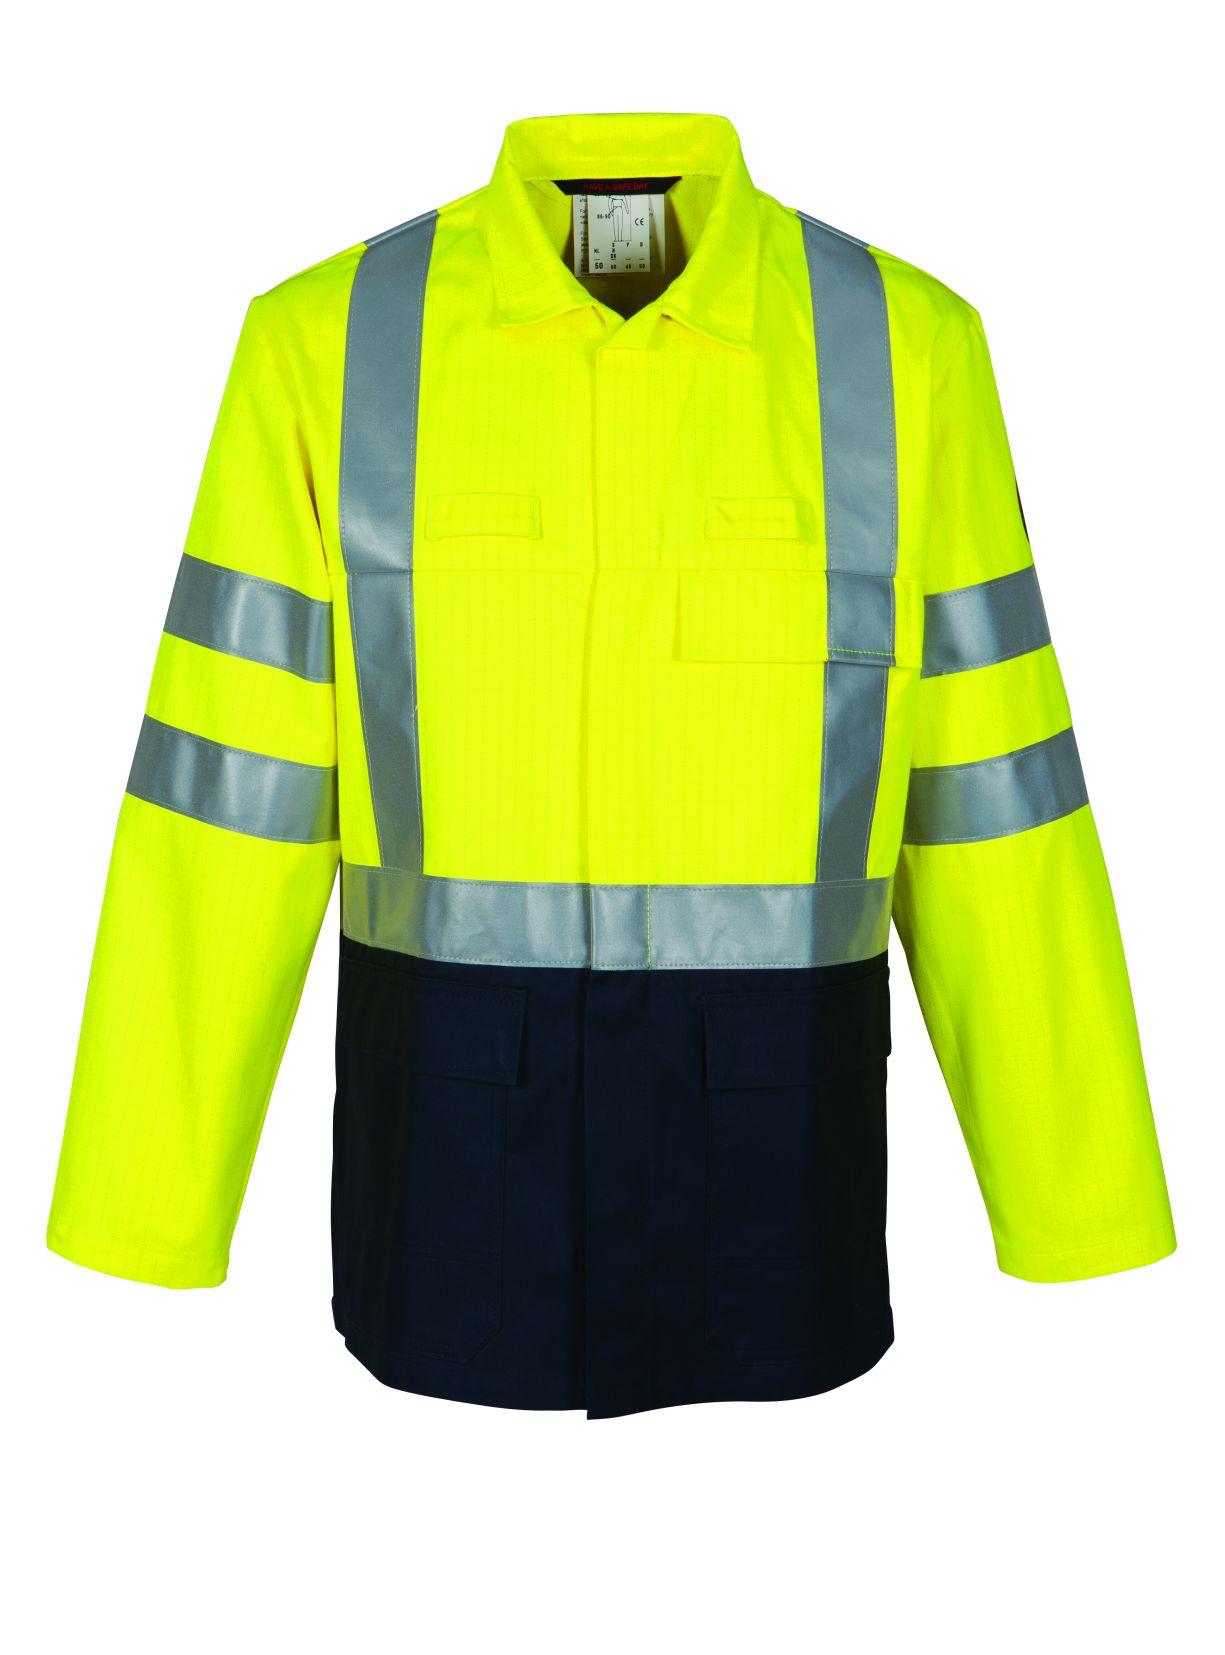 HaVeP Workwear/Protective wear Korte jas/Vest 30012